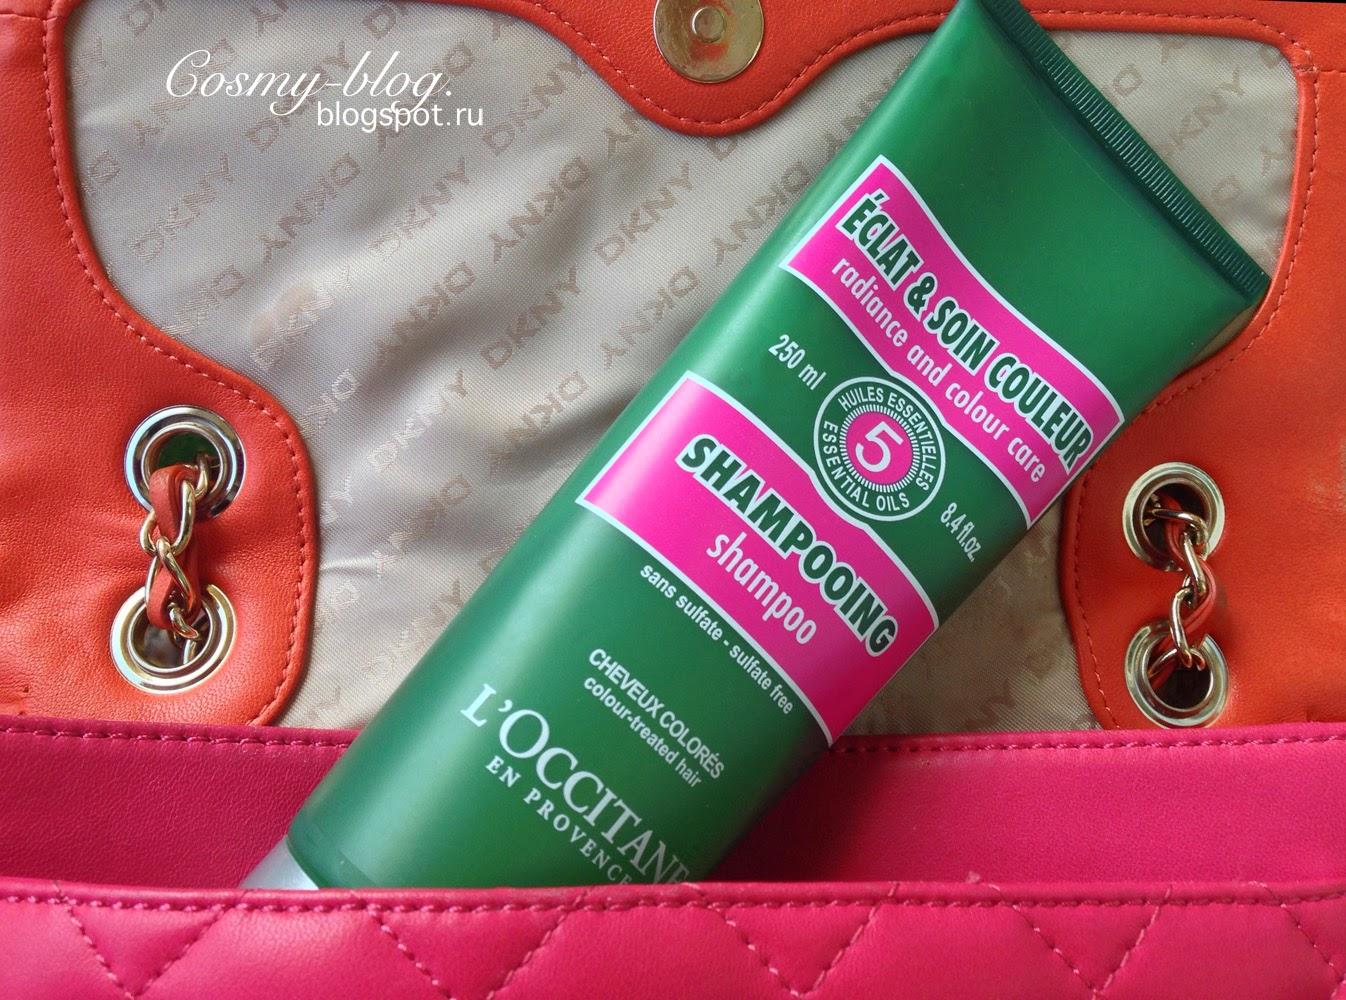 Шампунь L'Occitane en Provence Aromachologie Radiance and Color Care для окрашенных волос, локситан, локситэн